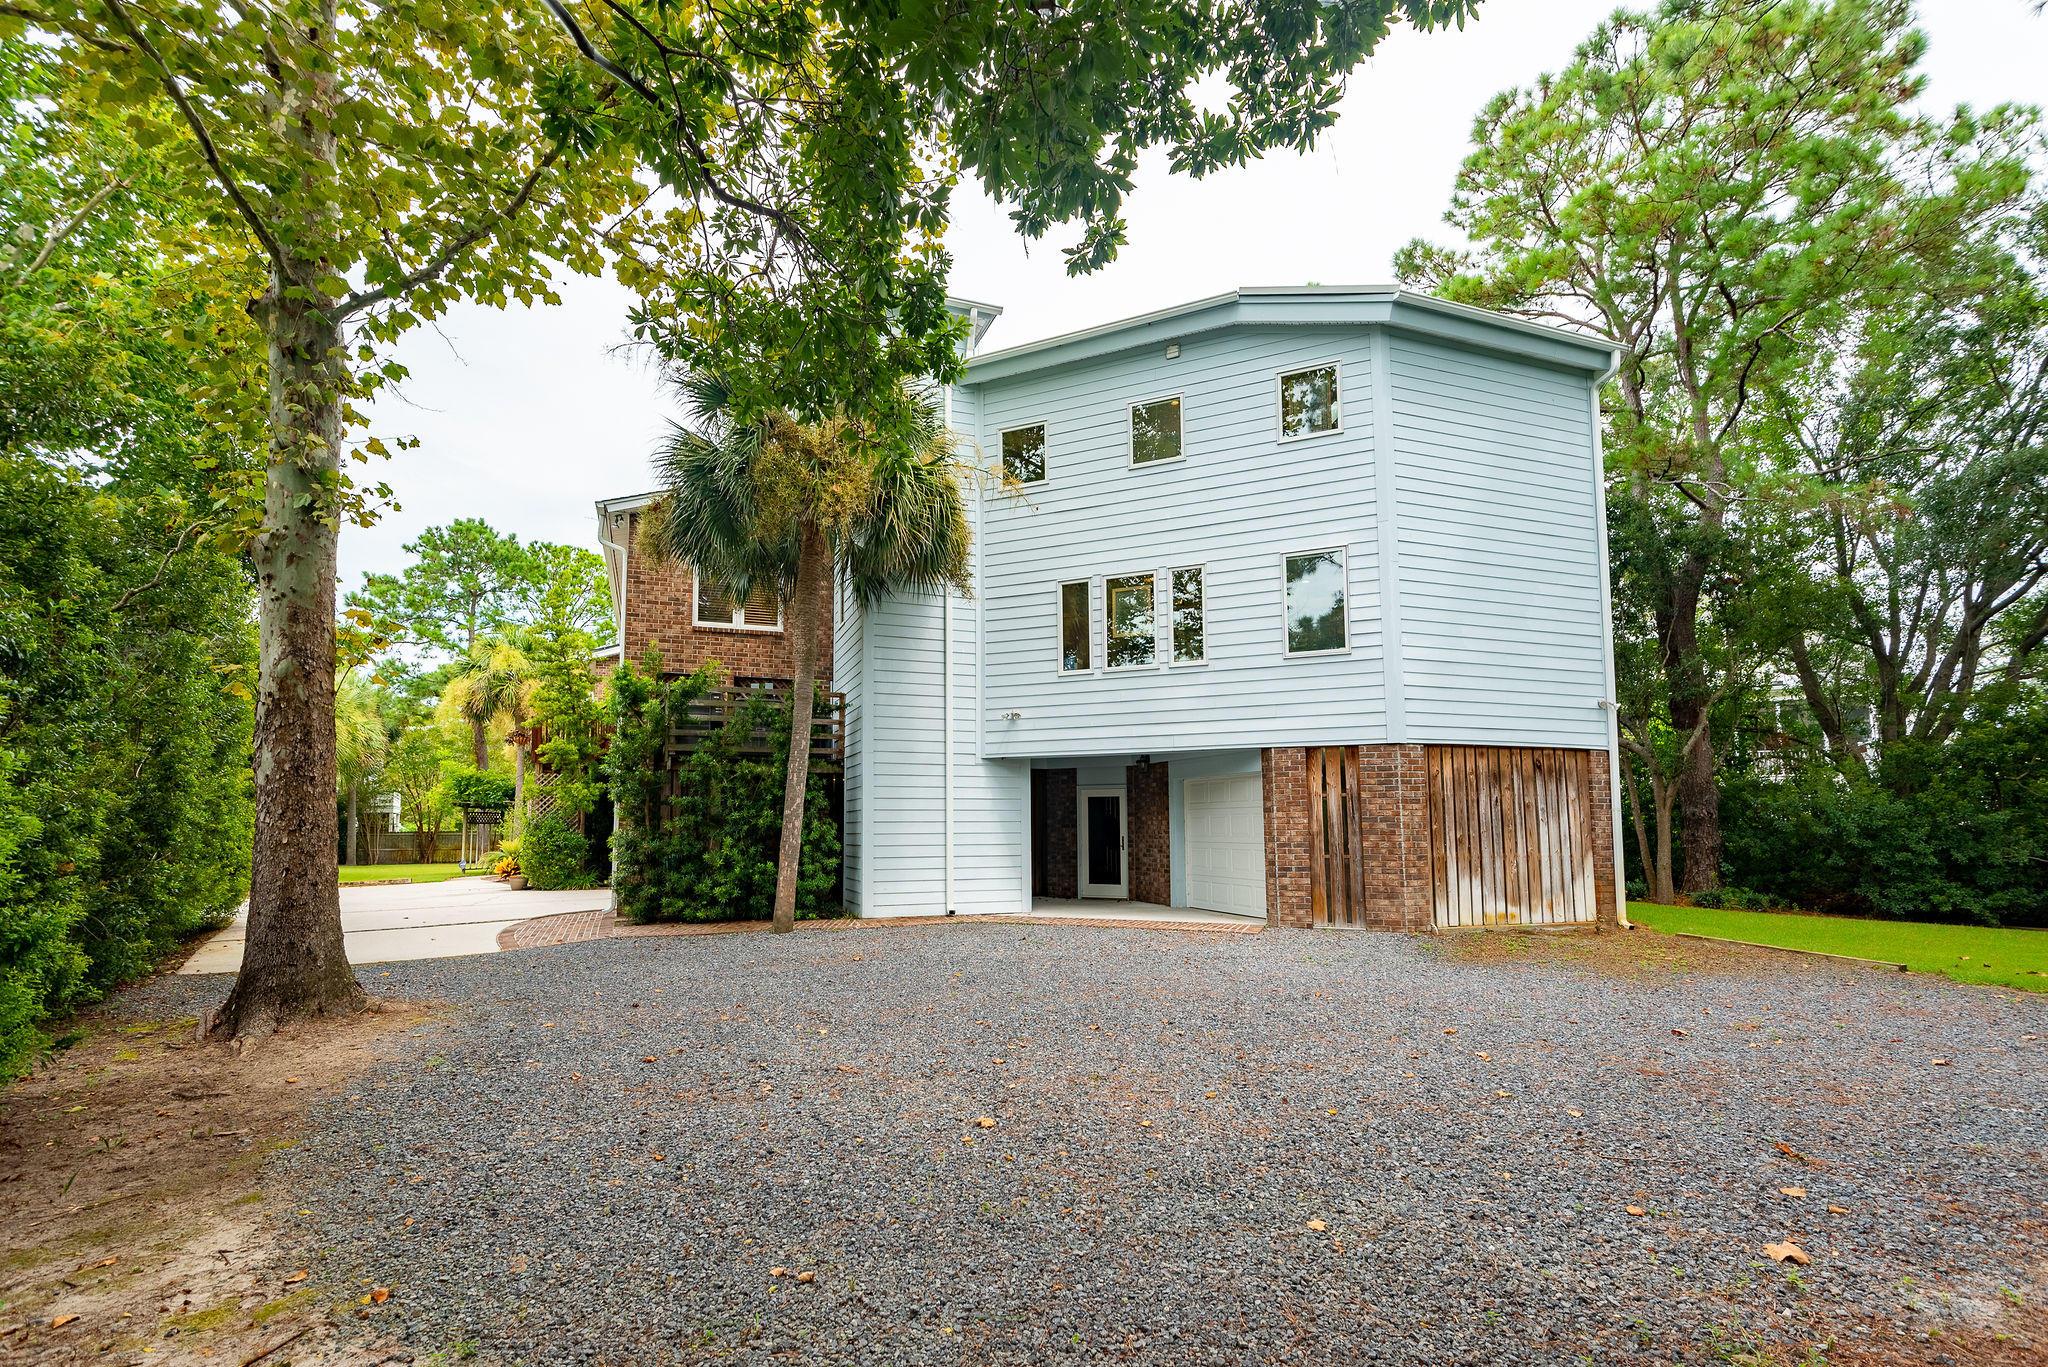 Home Farm Homes For Sale - 1564 Home Farm, Mount Pleasant, SC - 42